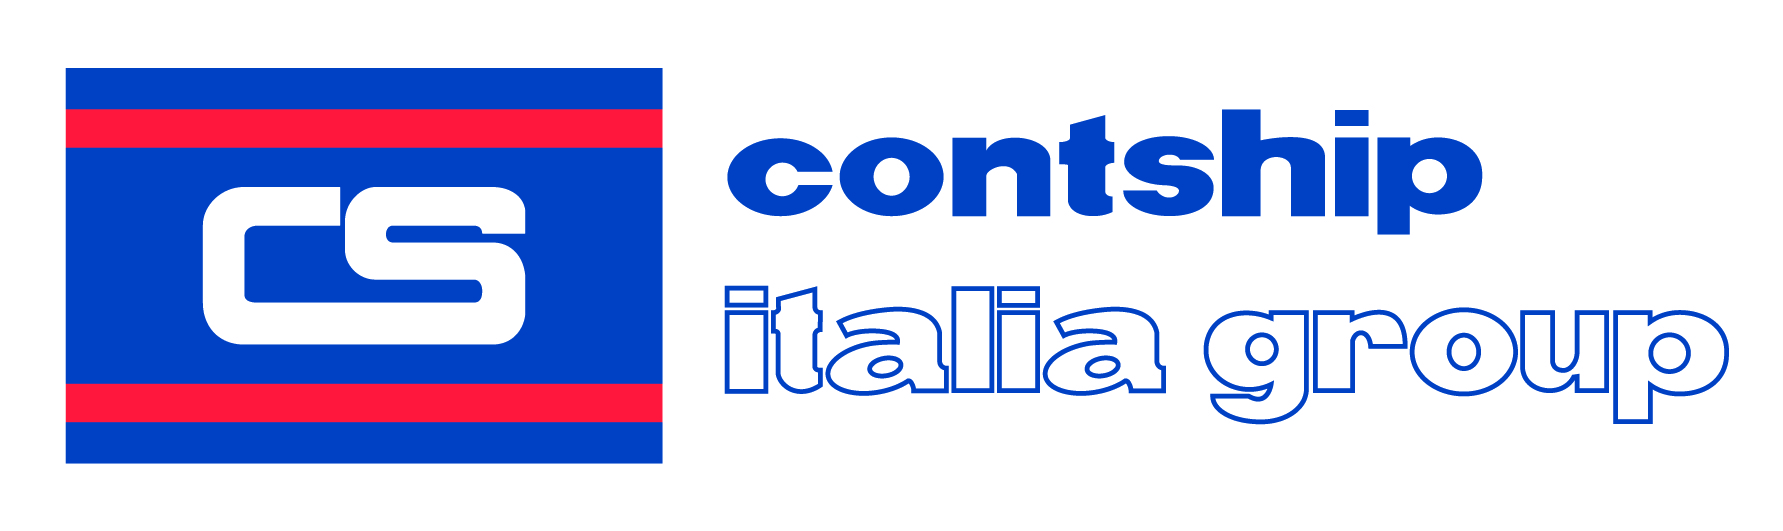 Contship CS_ITALIA_GROUP_band-01.jpg